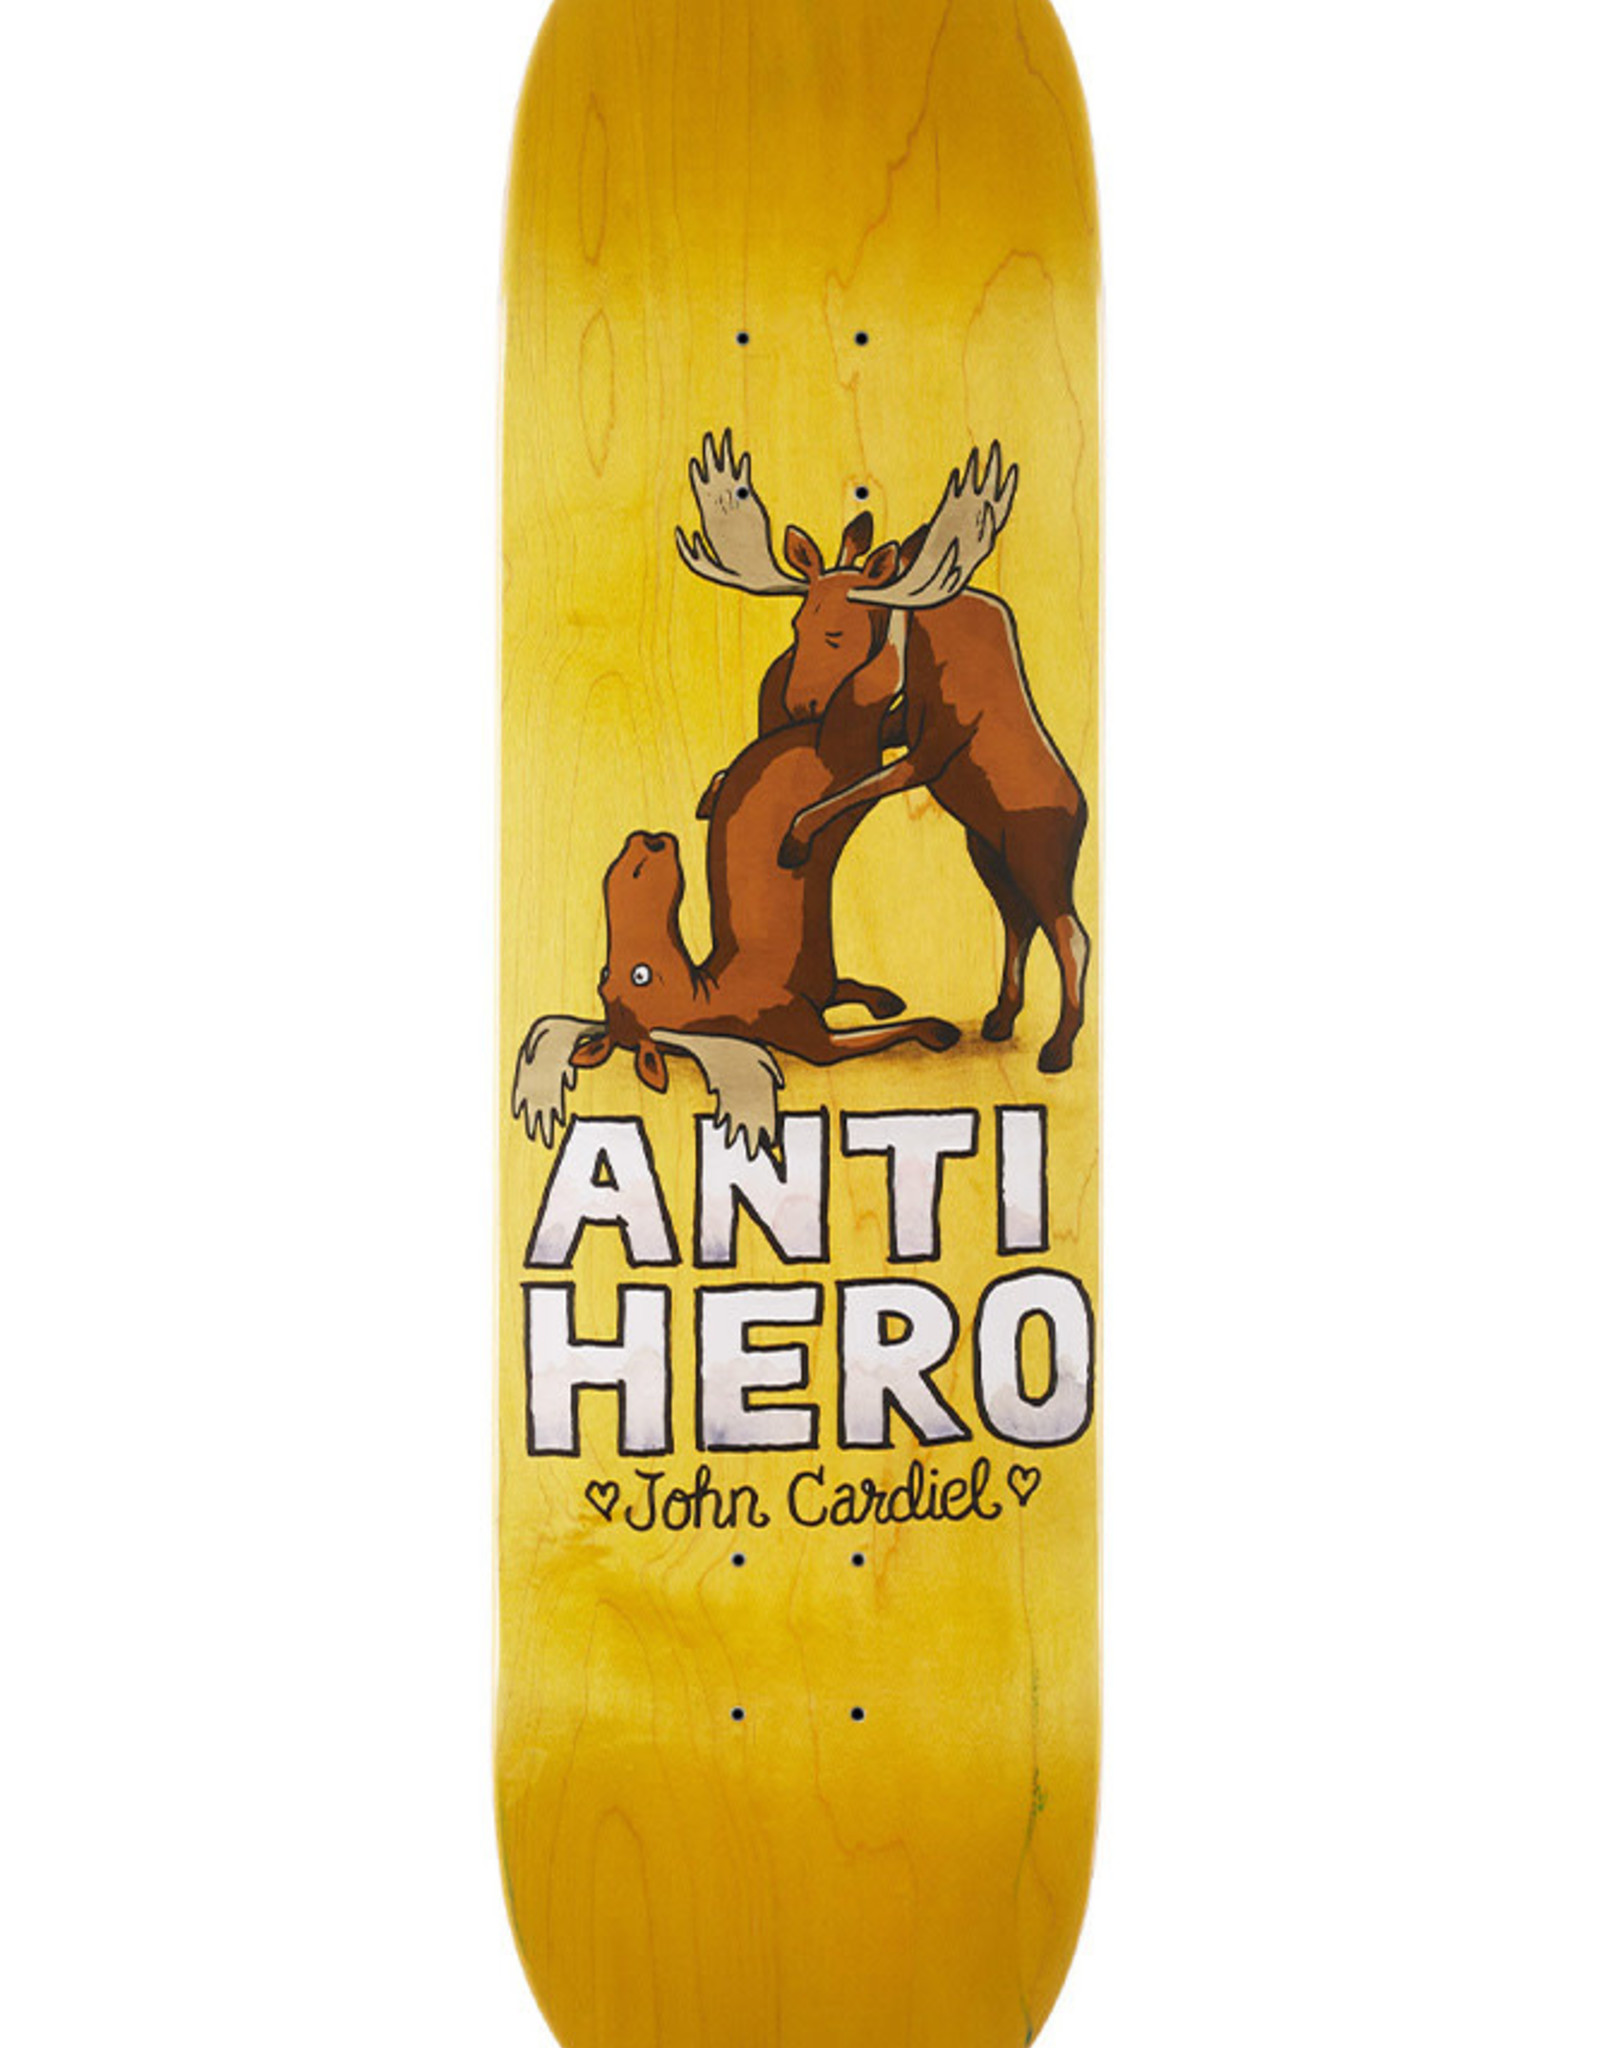 "ANTI-HERO ANTI-HERO 8.25"" JOHN CARDIEL LOVERS DECK"